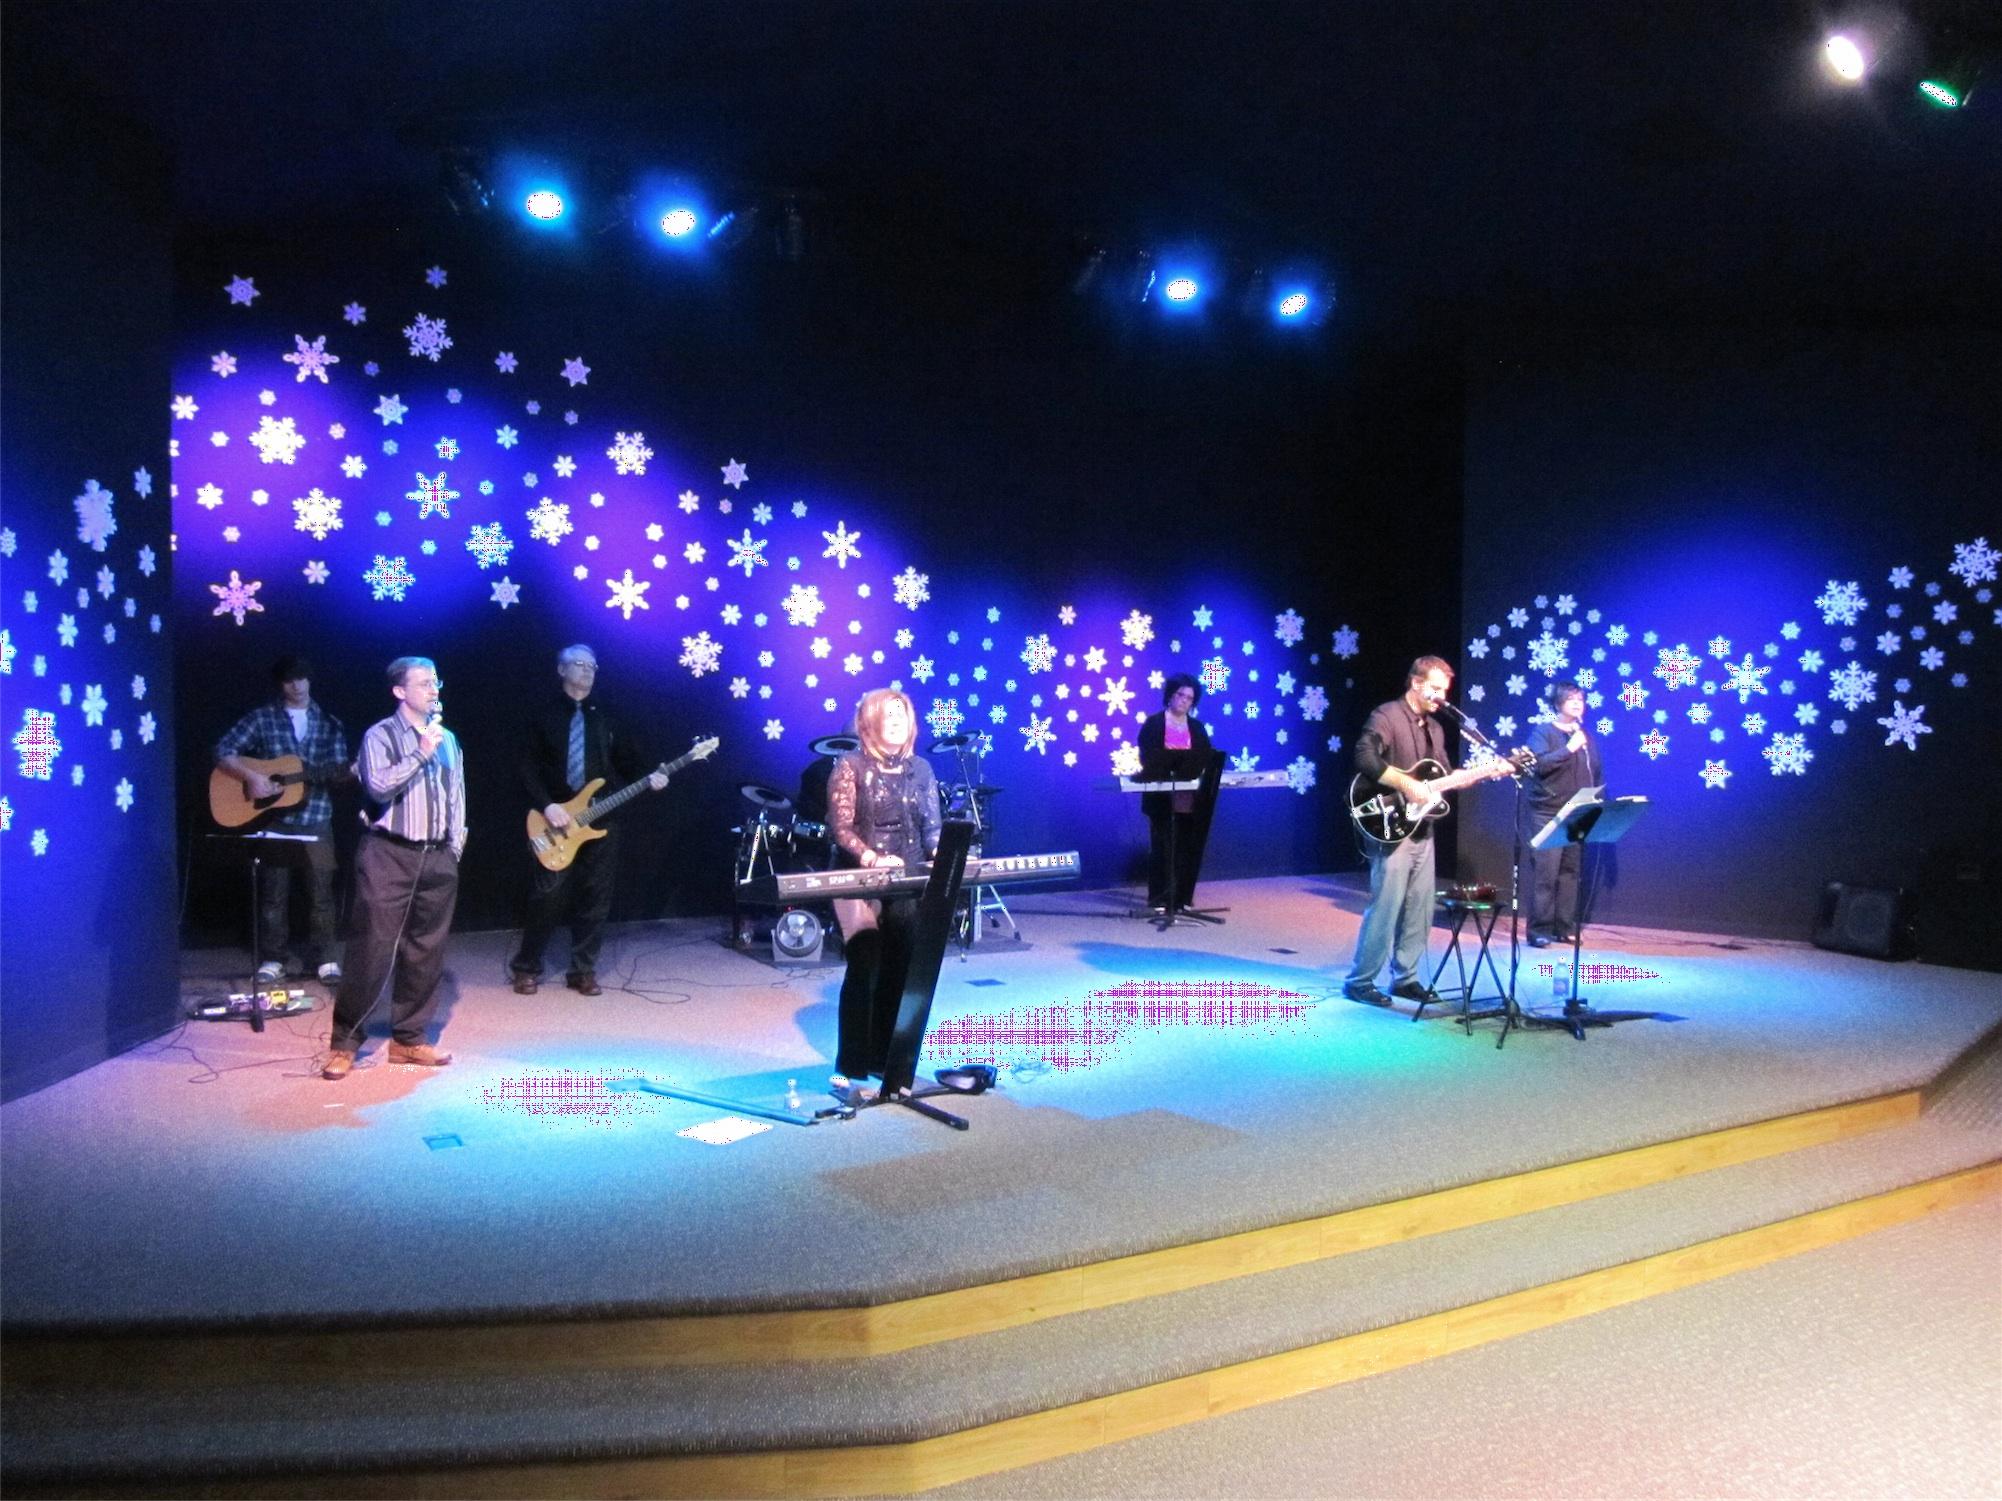 Snowdrift Church Stage Design Ideas Scenic Sets And Stage Design Ideas From Churches Around The Globe